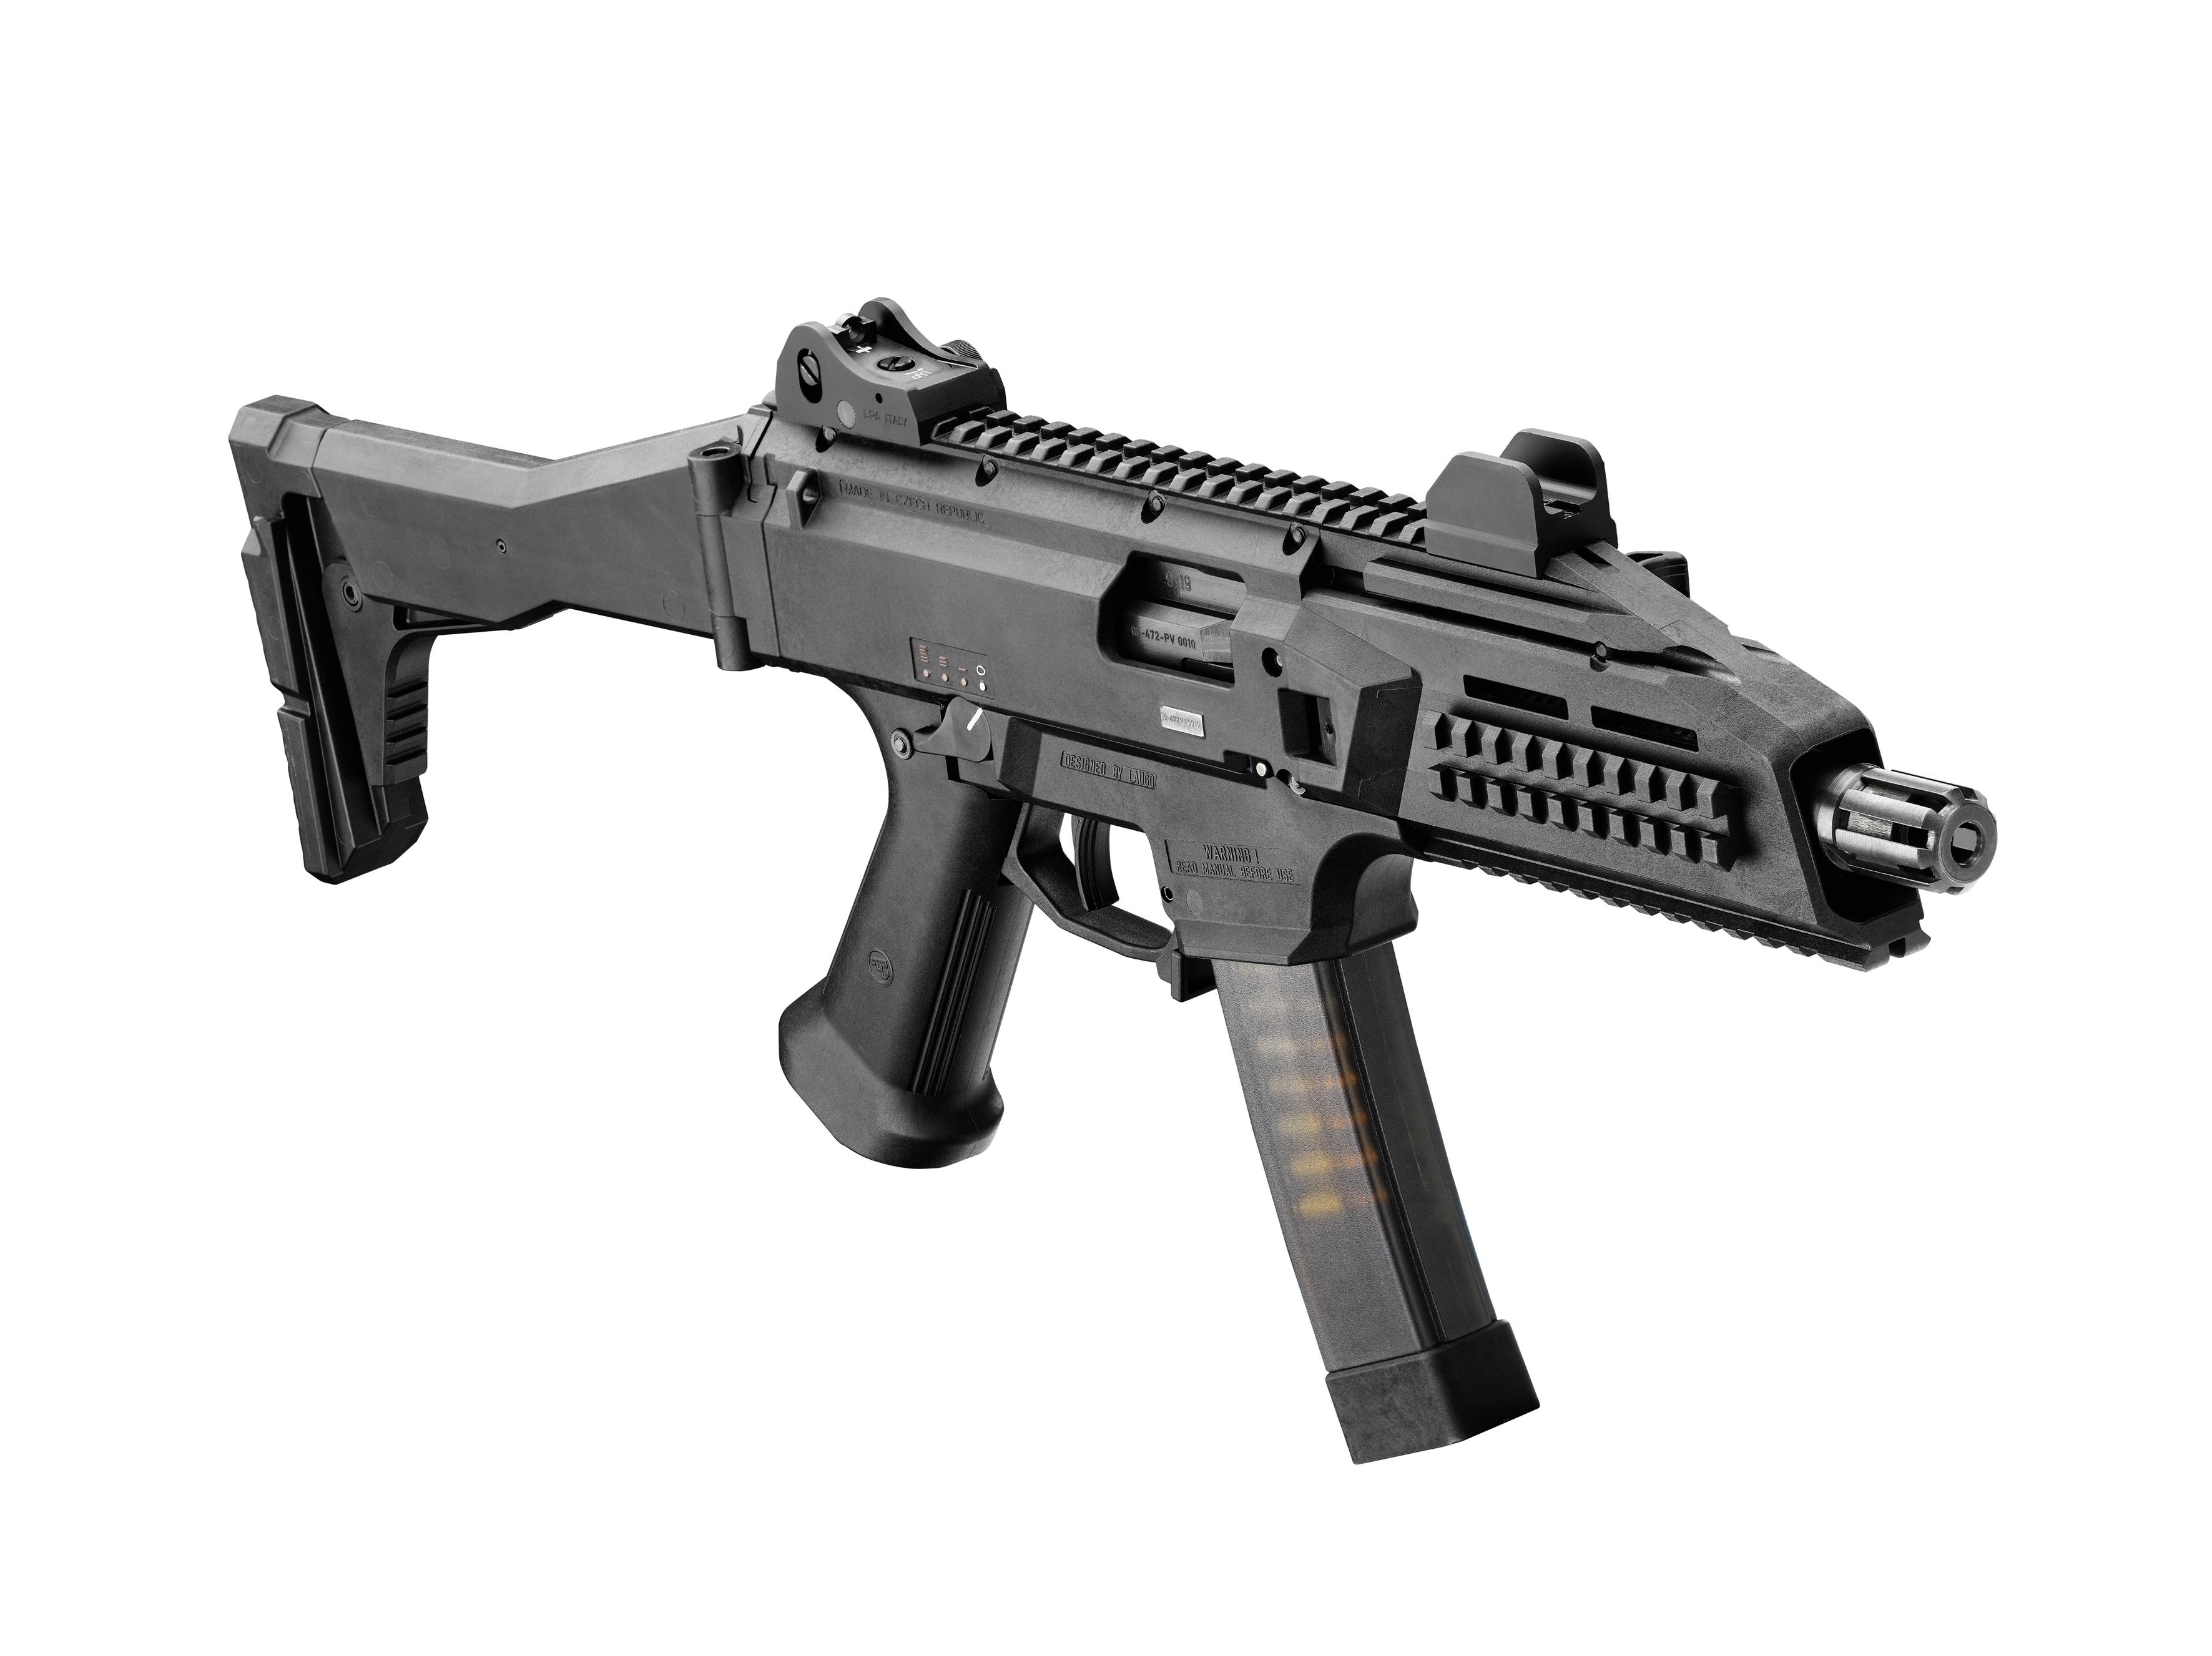 For sale trade imi uzi carbine made in israel 9mm - Cz Scorpion Evo 3 A1 Samopaly Produkty